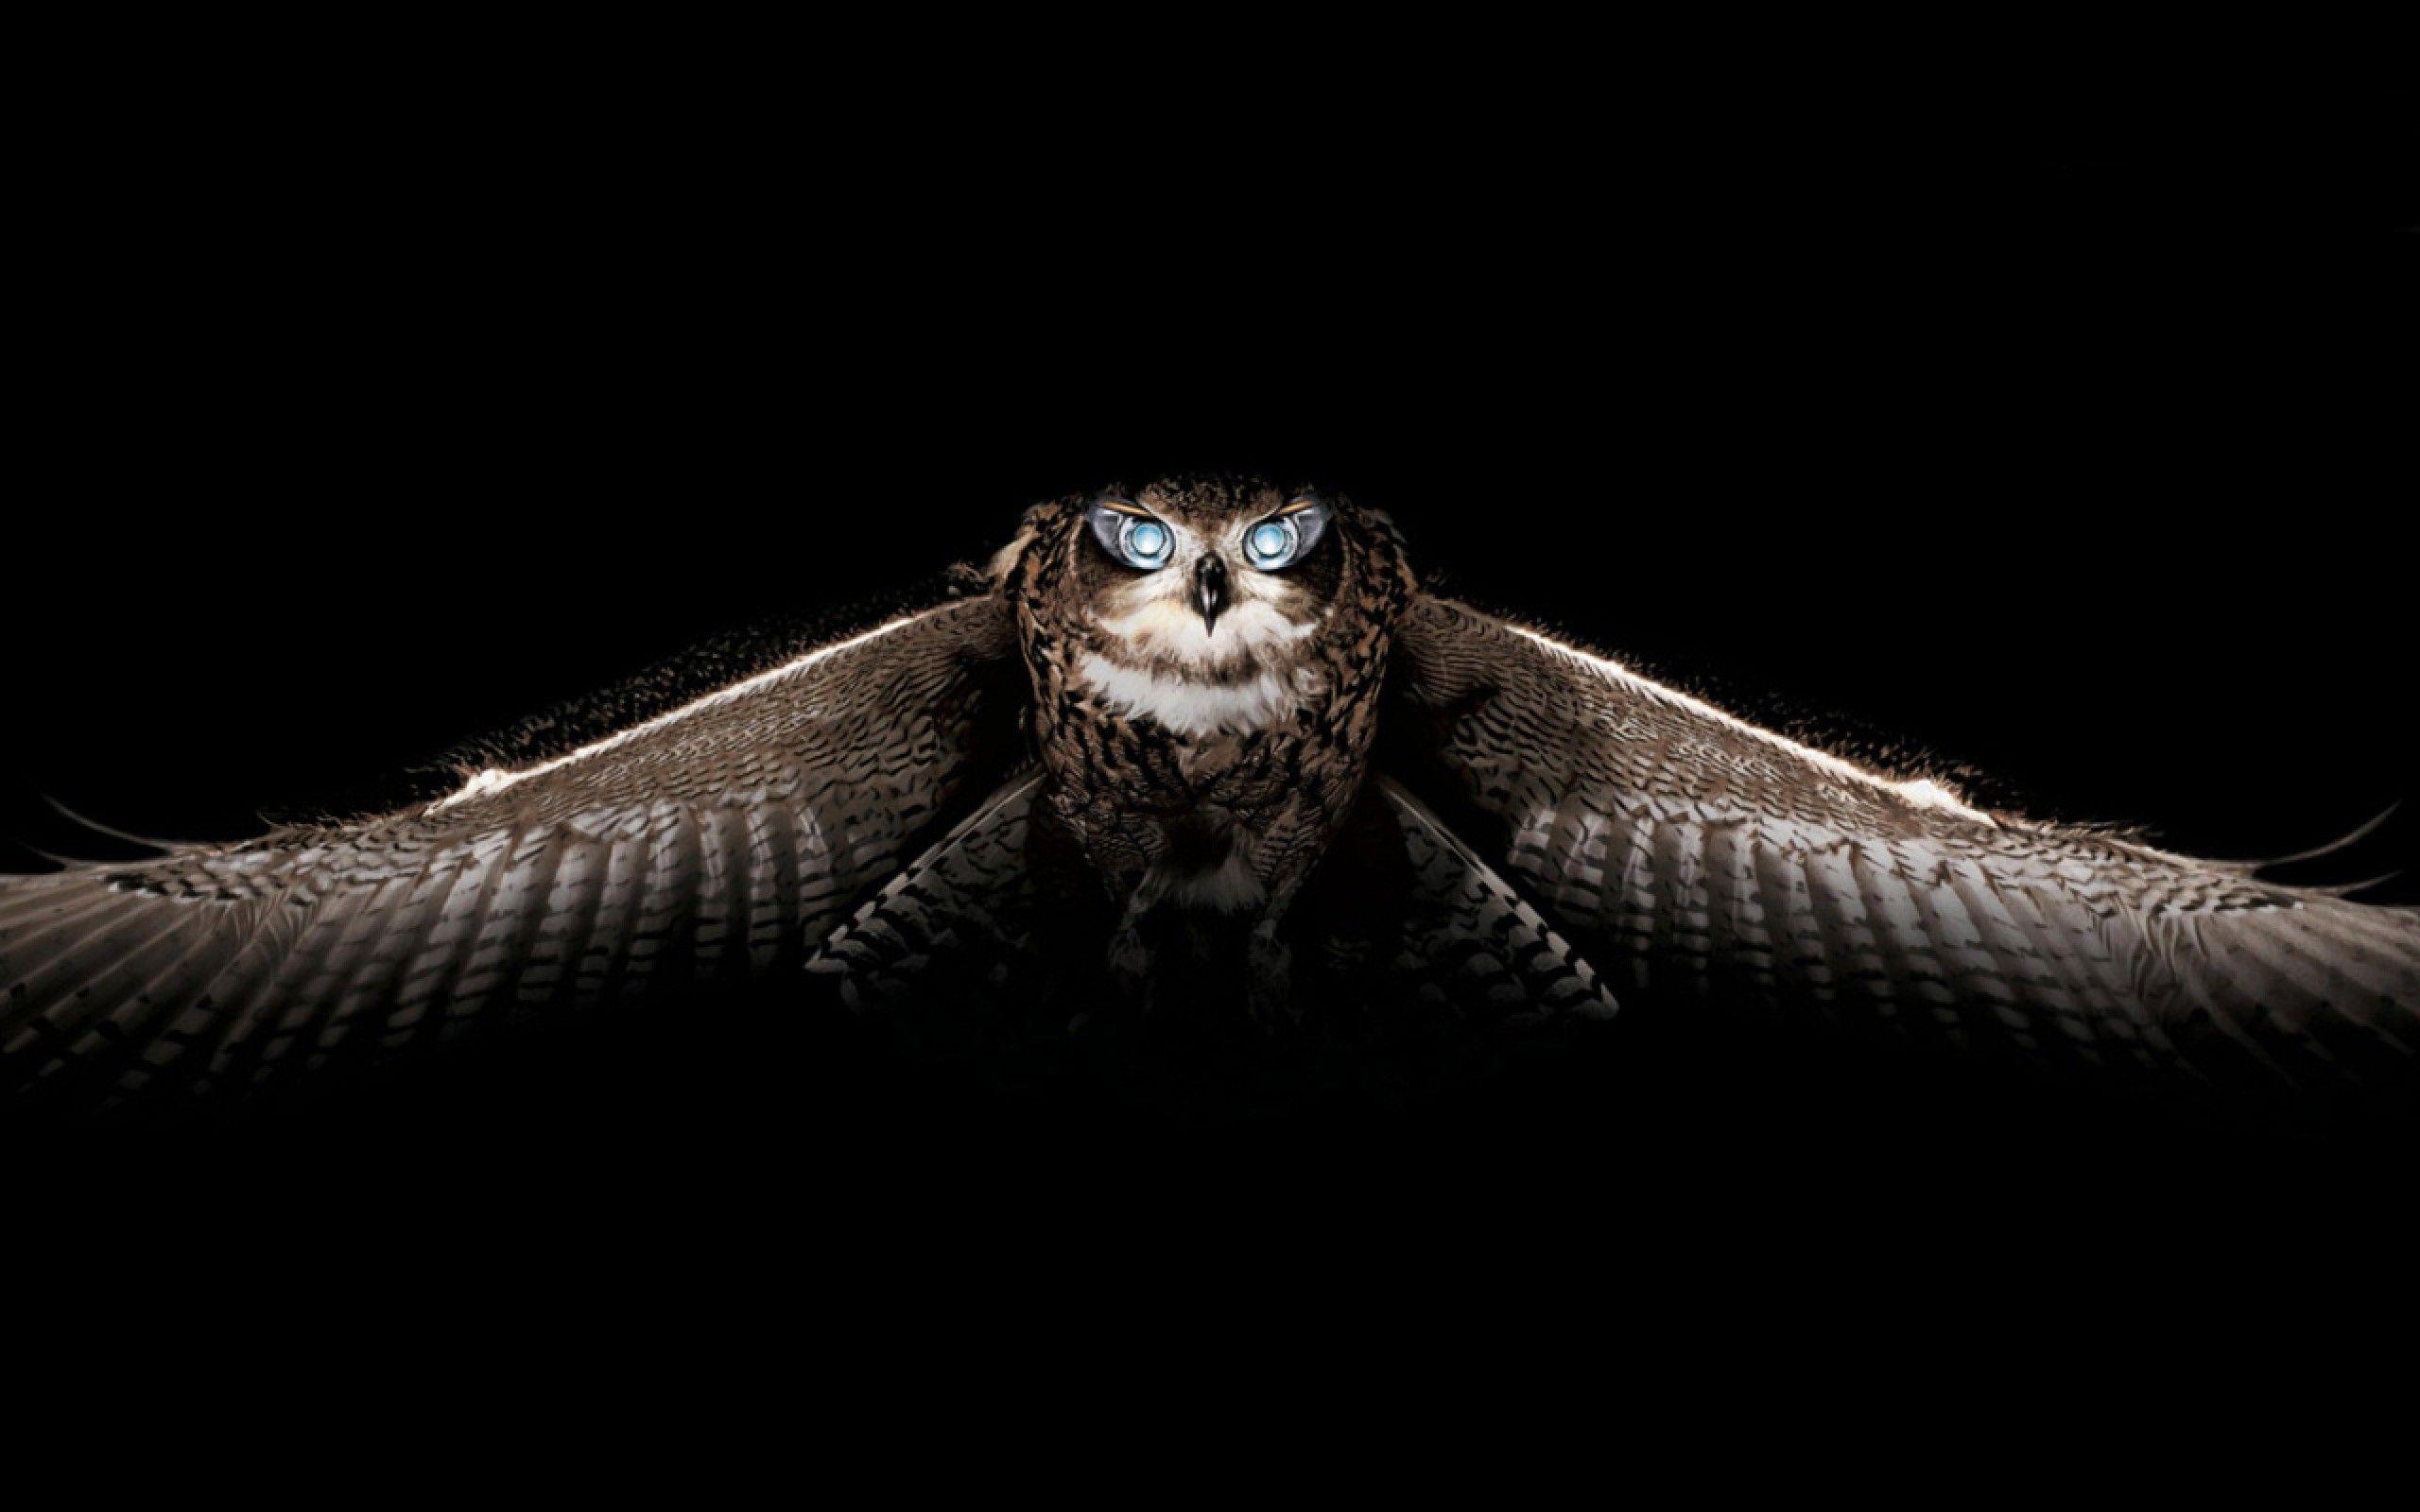 Dark Background Owl Images